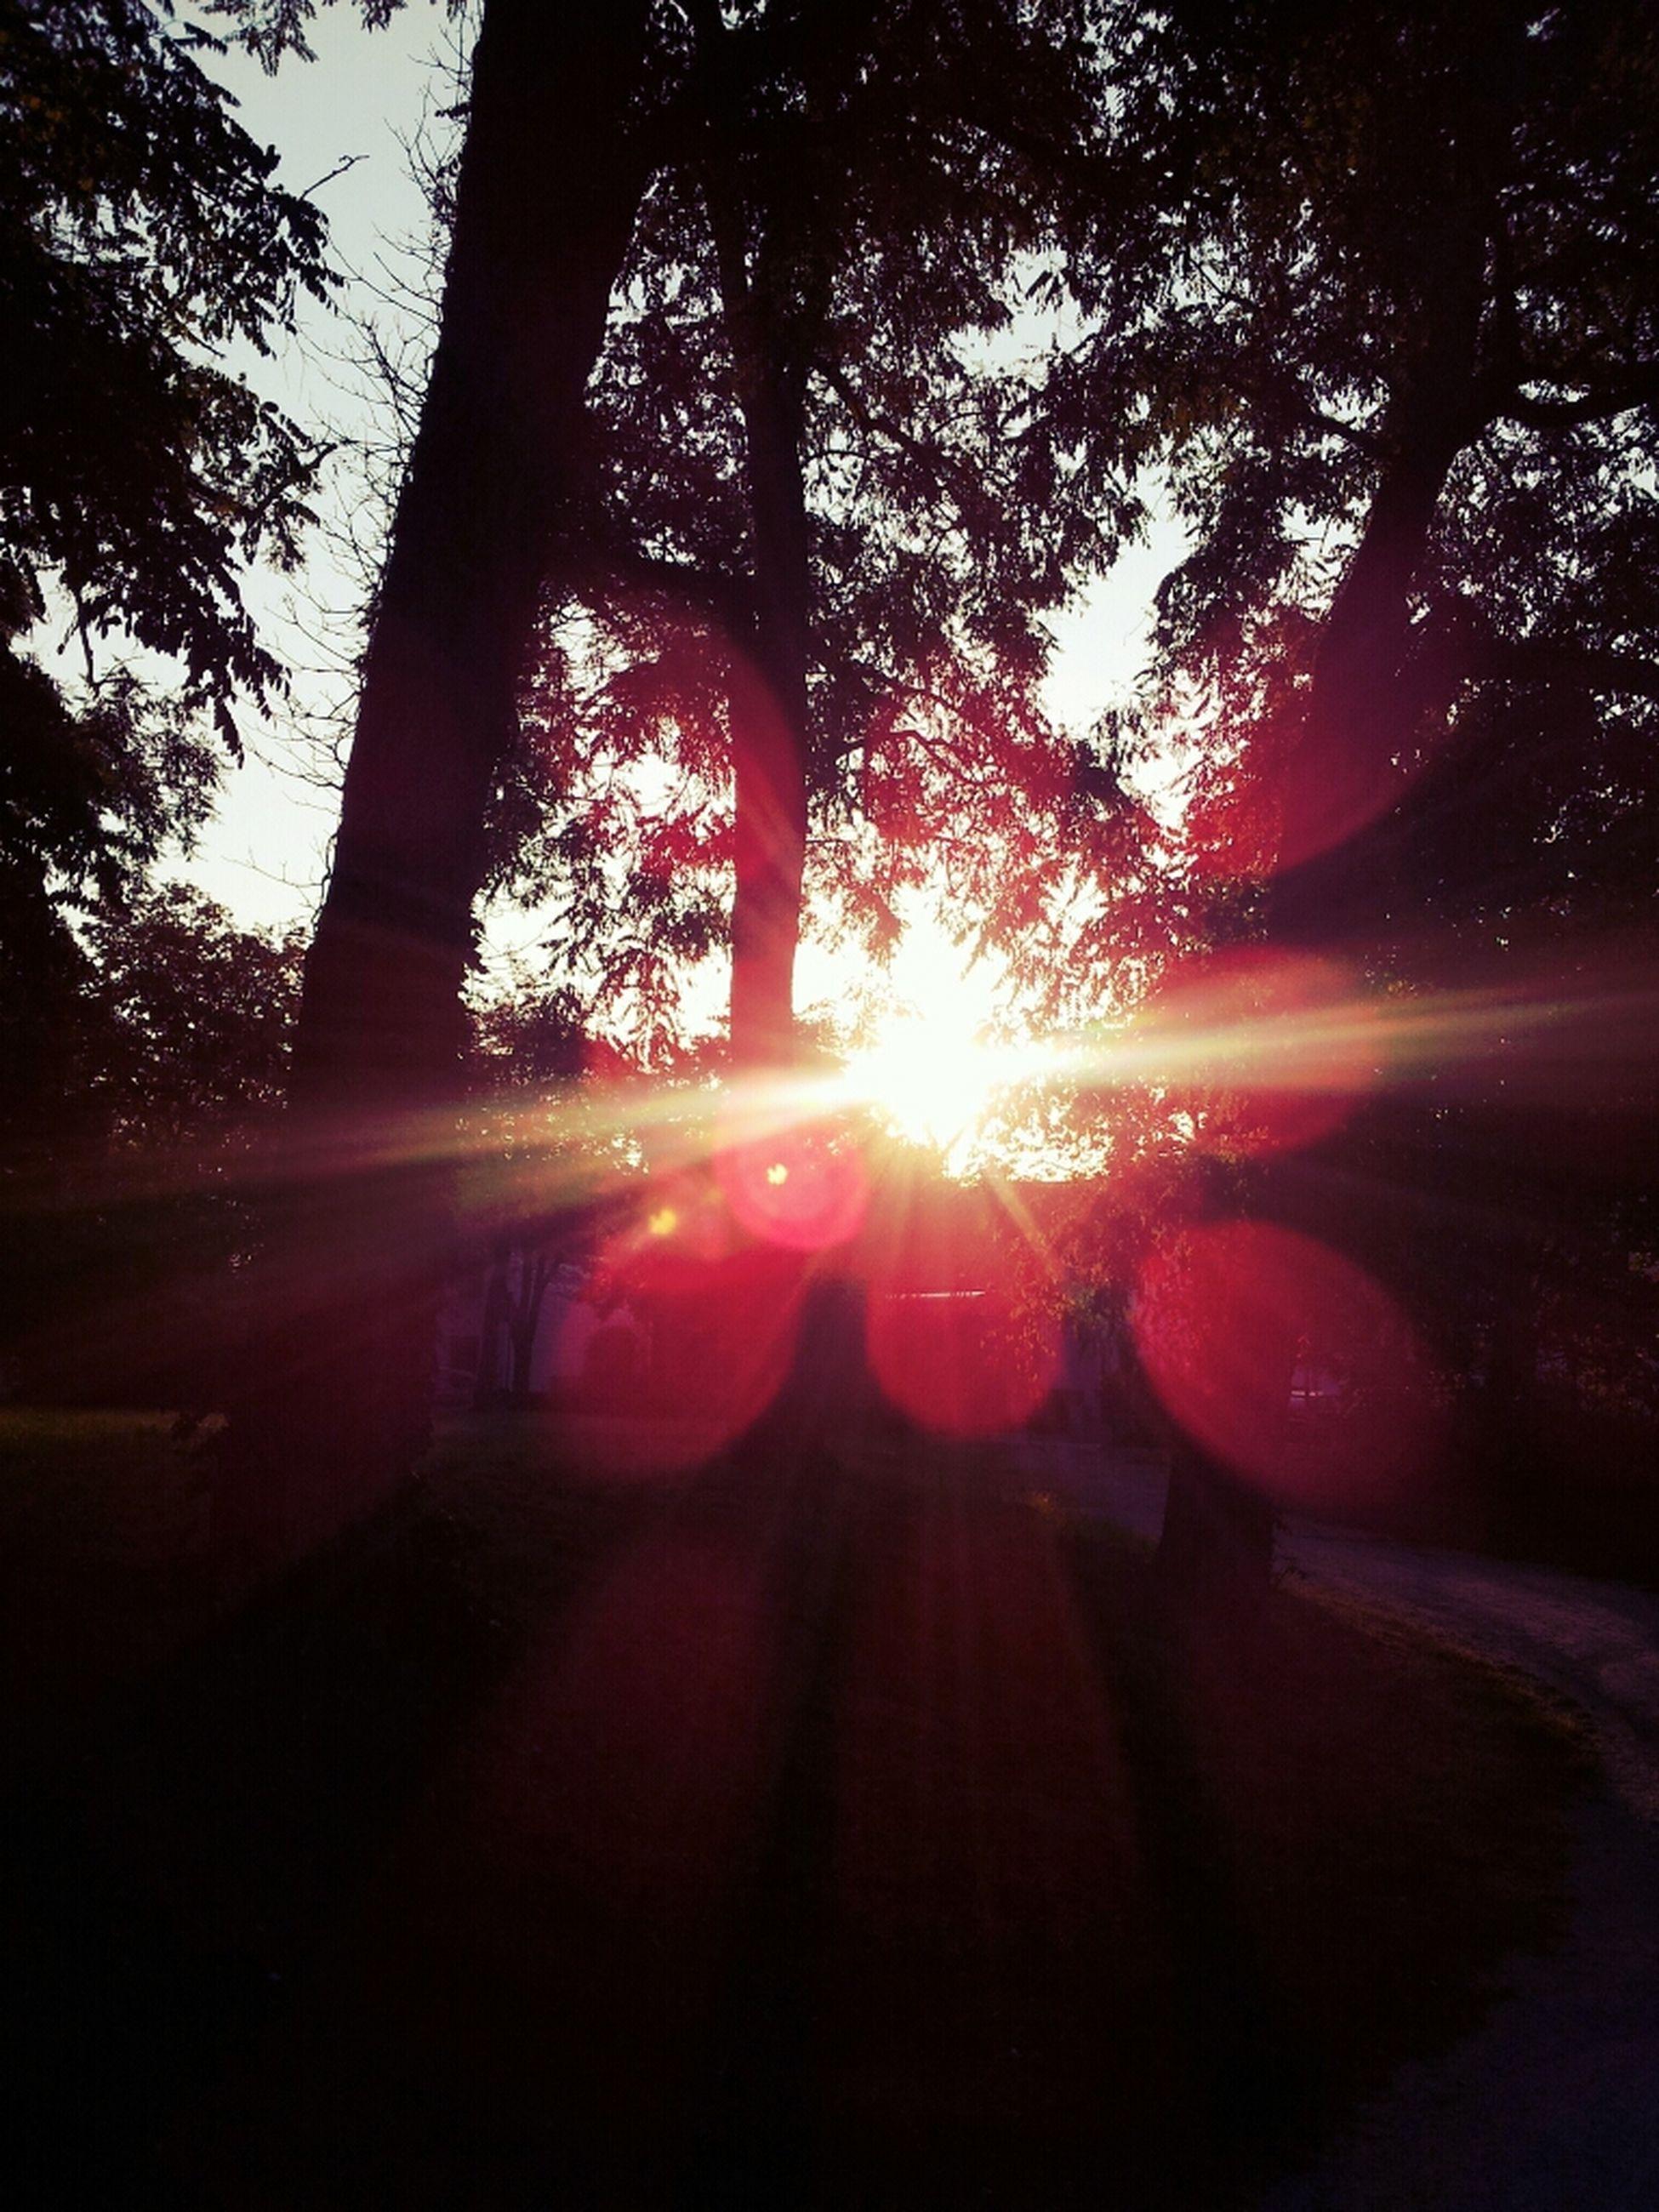 sun, tree, transportation, sunbeam, sunlight, lens flare, sunset, silhouette, car, land vehicle, road, mode of transport, the way forward, travel, back lit, sky, nature, shadow, street, tranquility